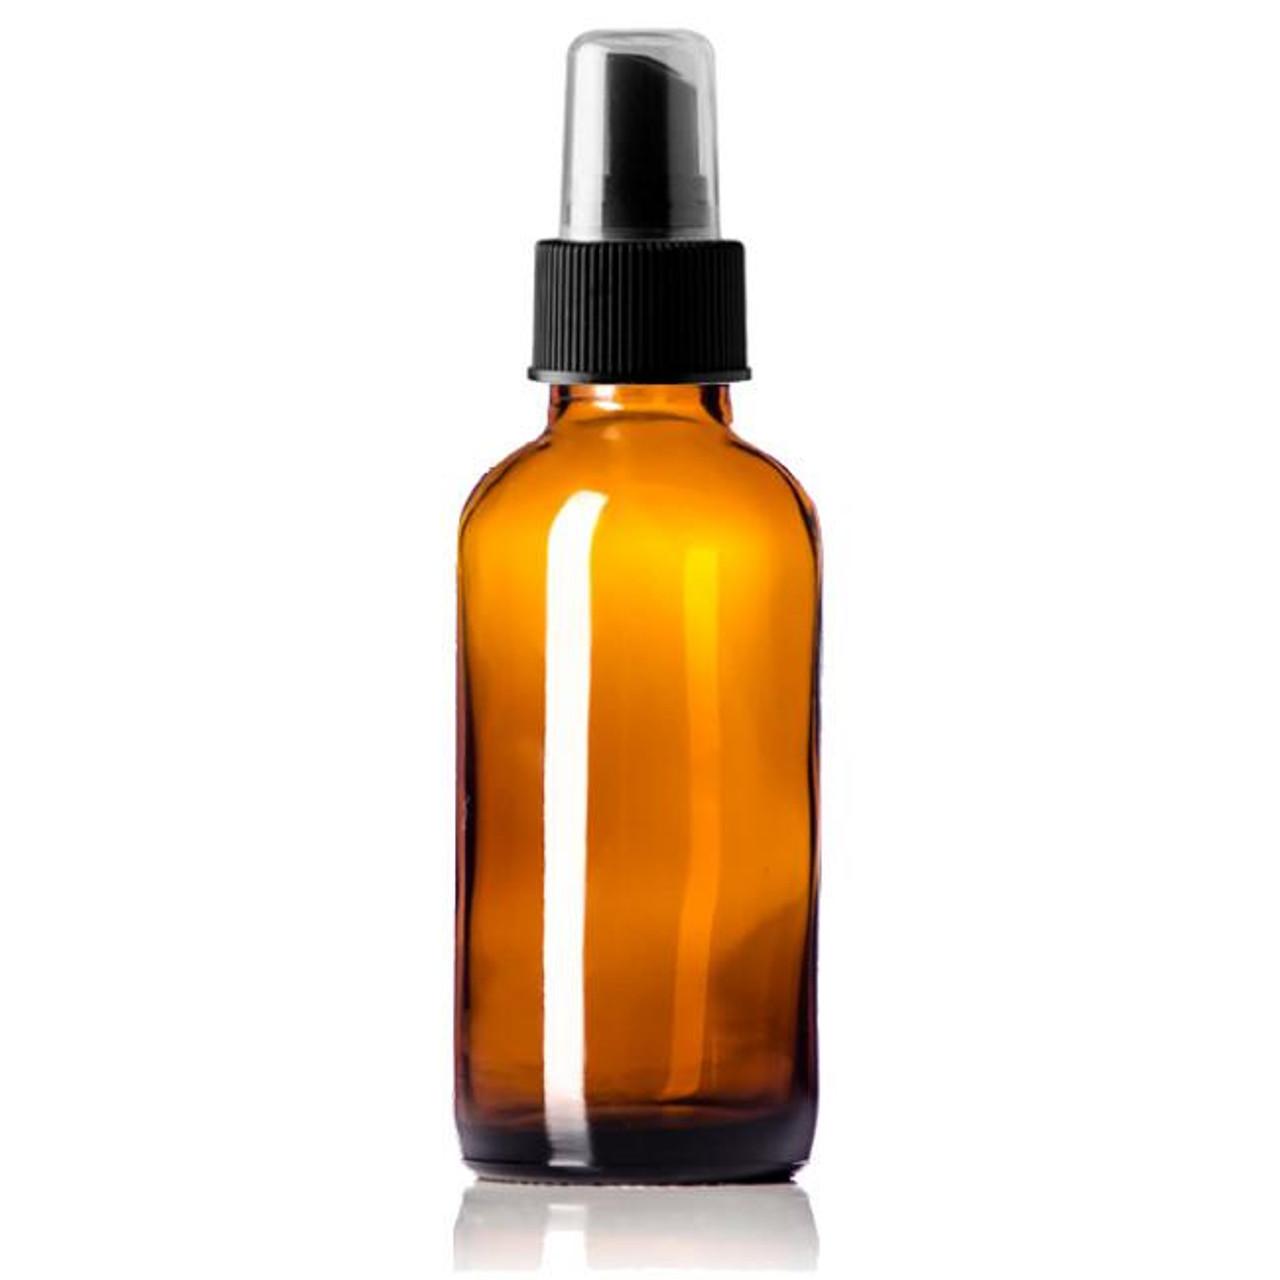 Image result for 2oz amber glass spray hand sanitizer